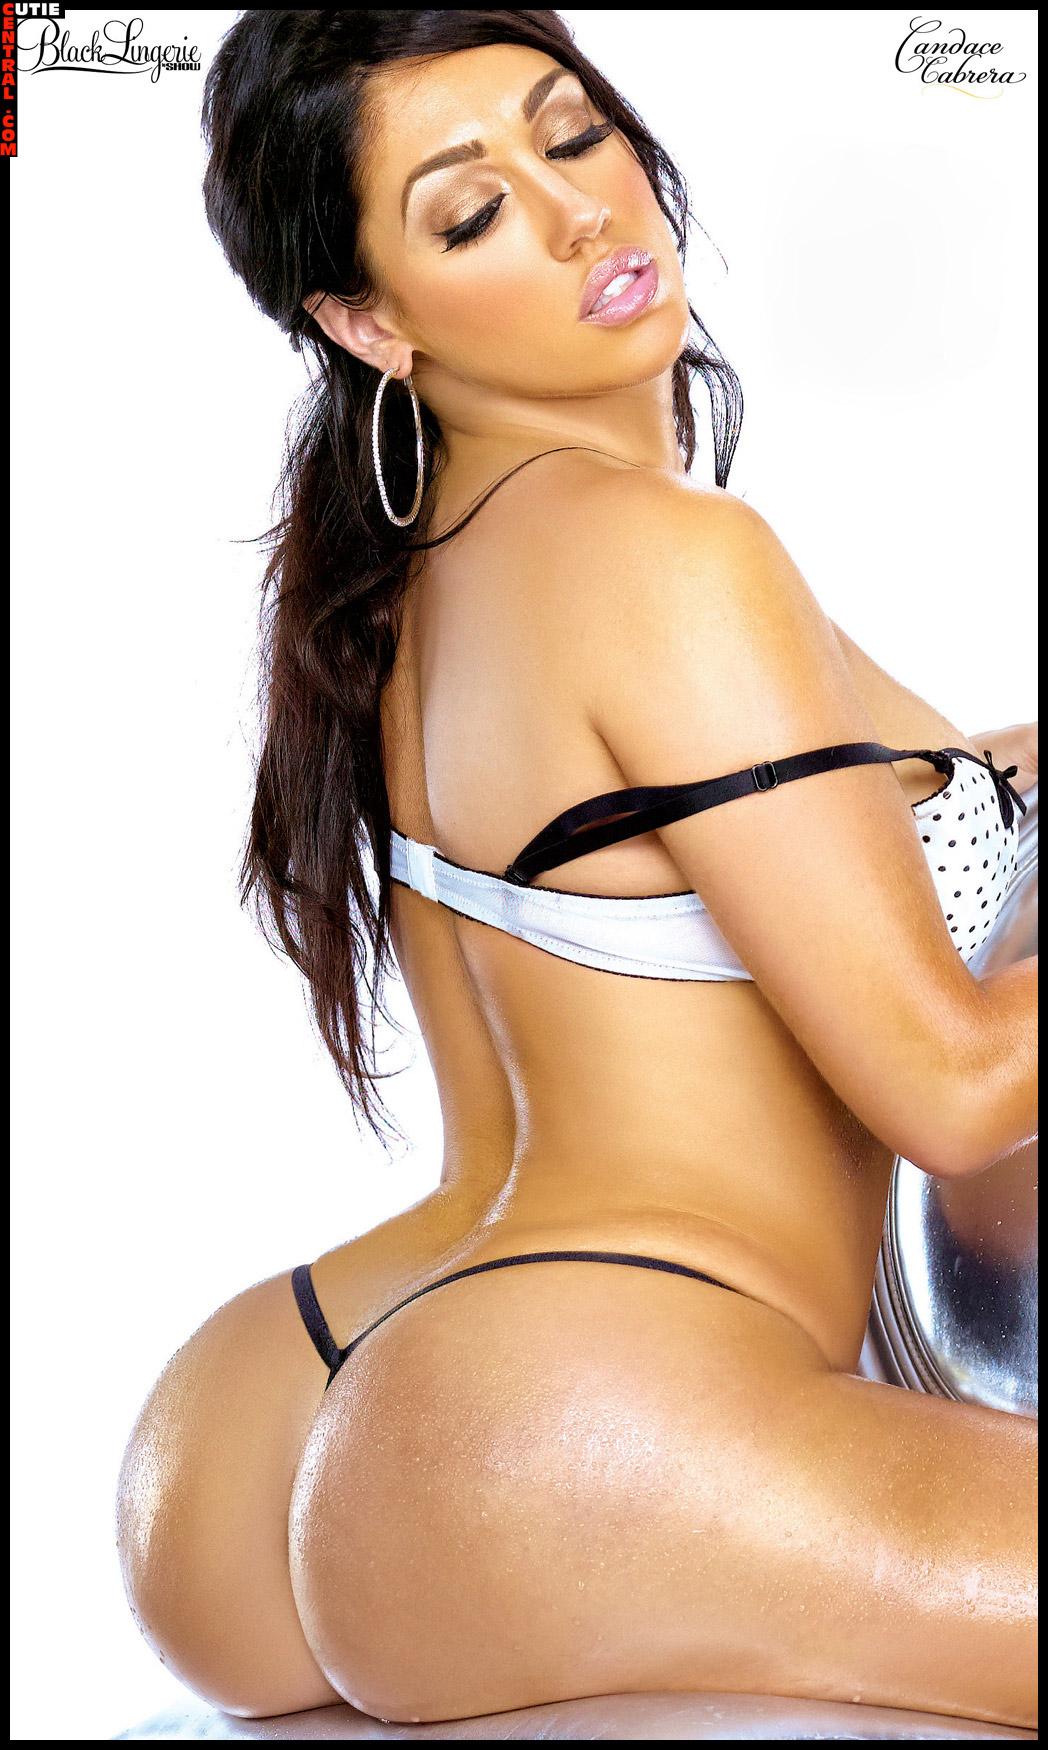 Ralph big tits magazine models